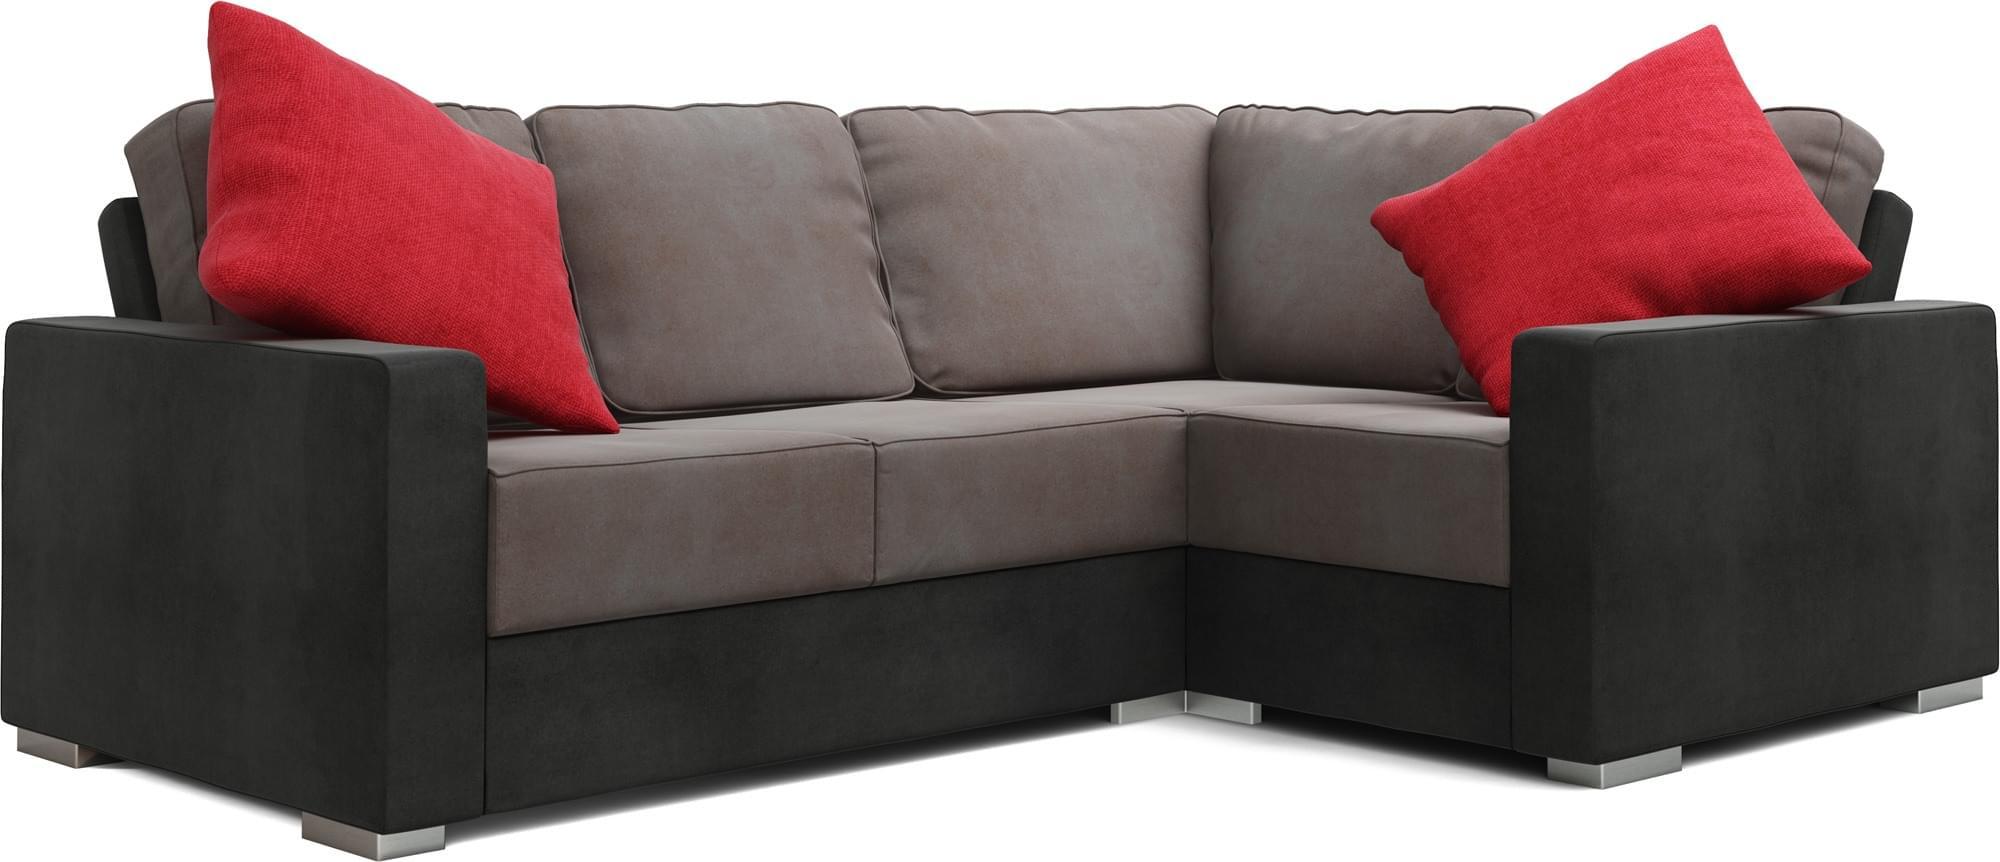 Lear 3X2 Corner Sofa Bed   Corner Sofa Bed   Nabru